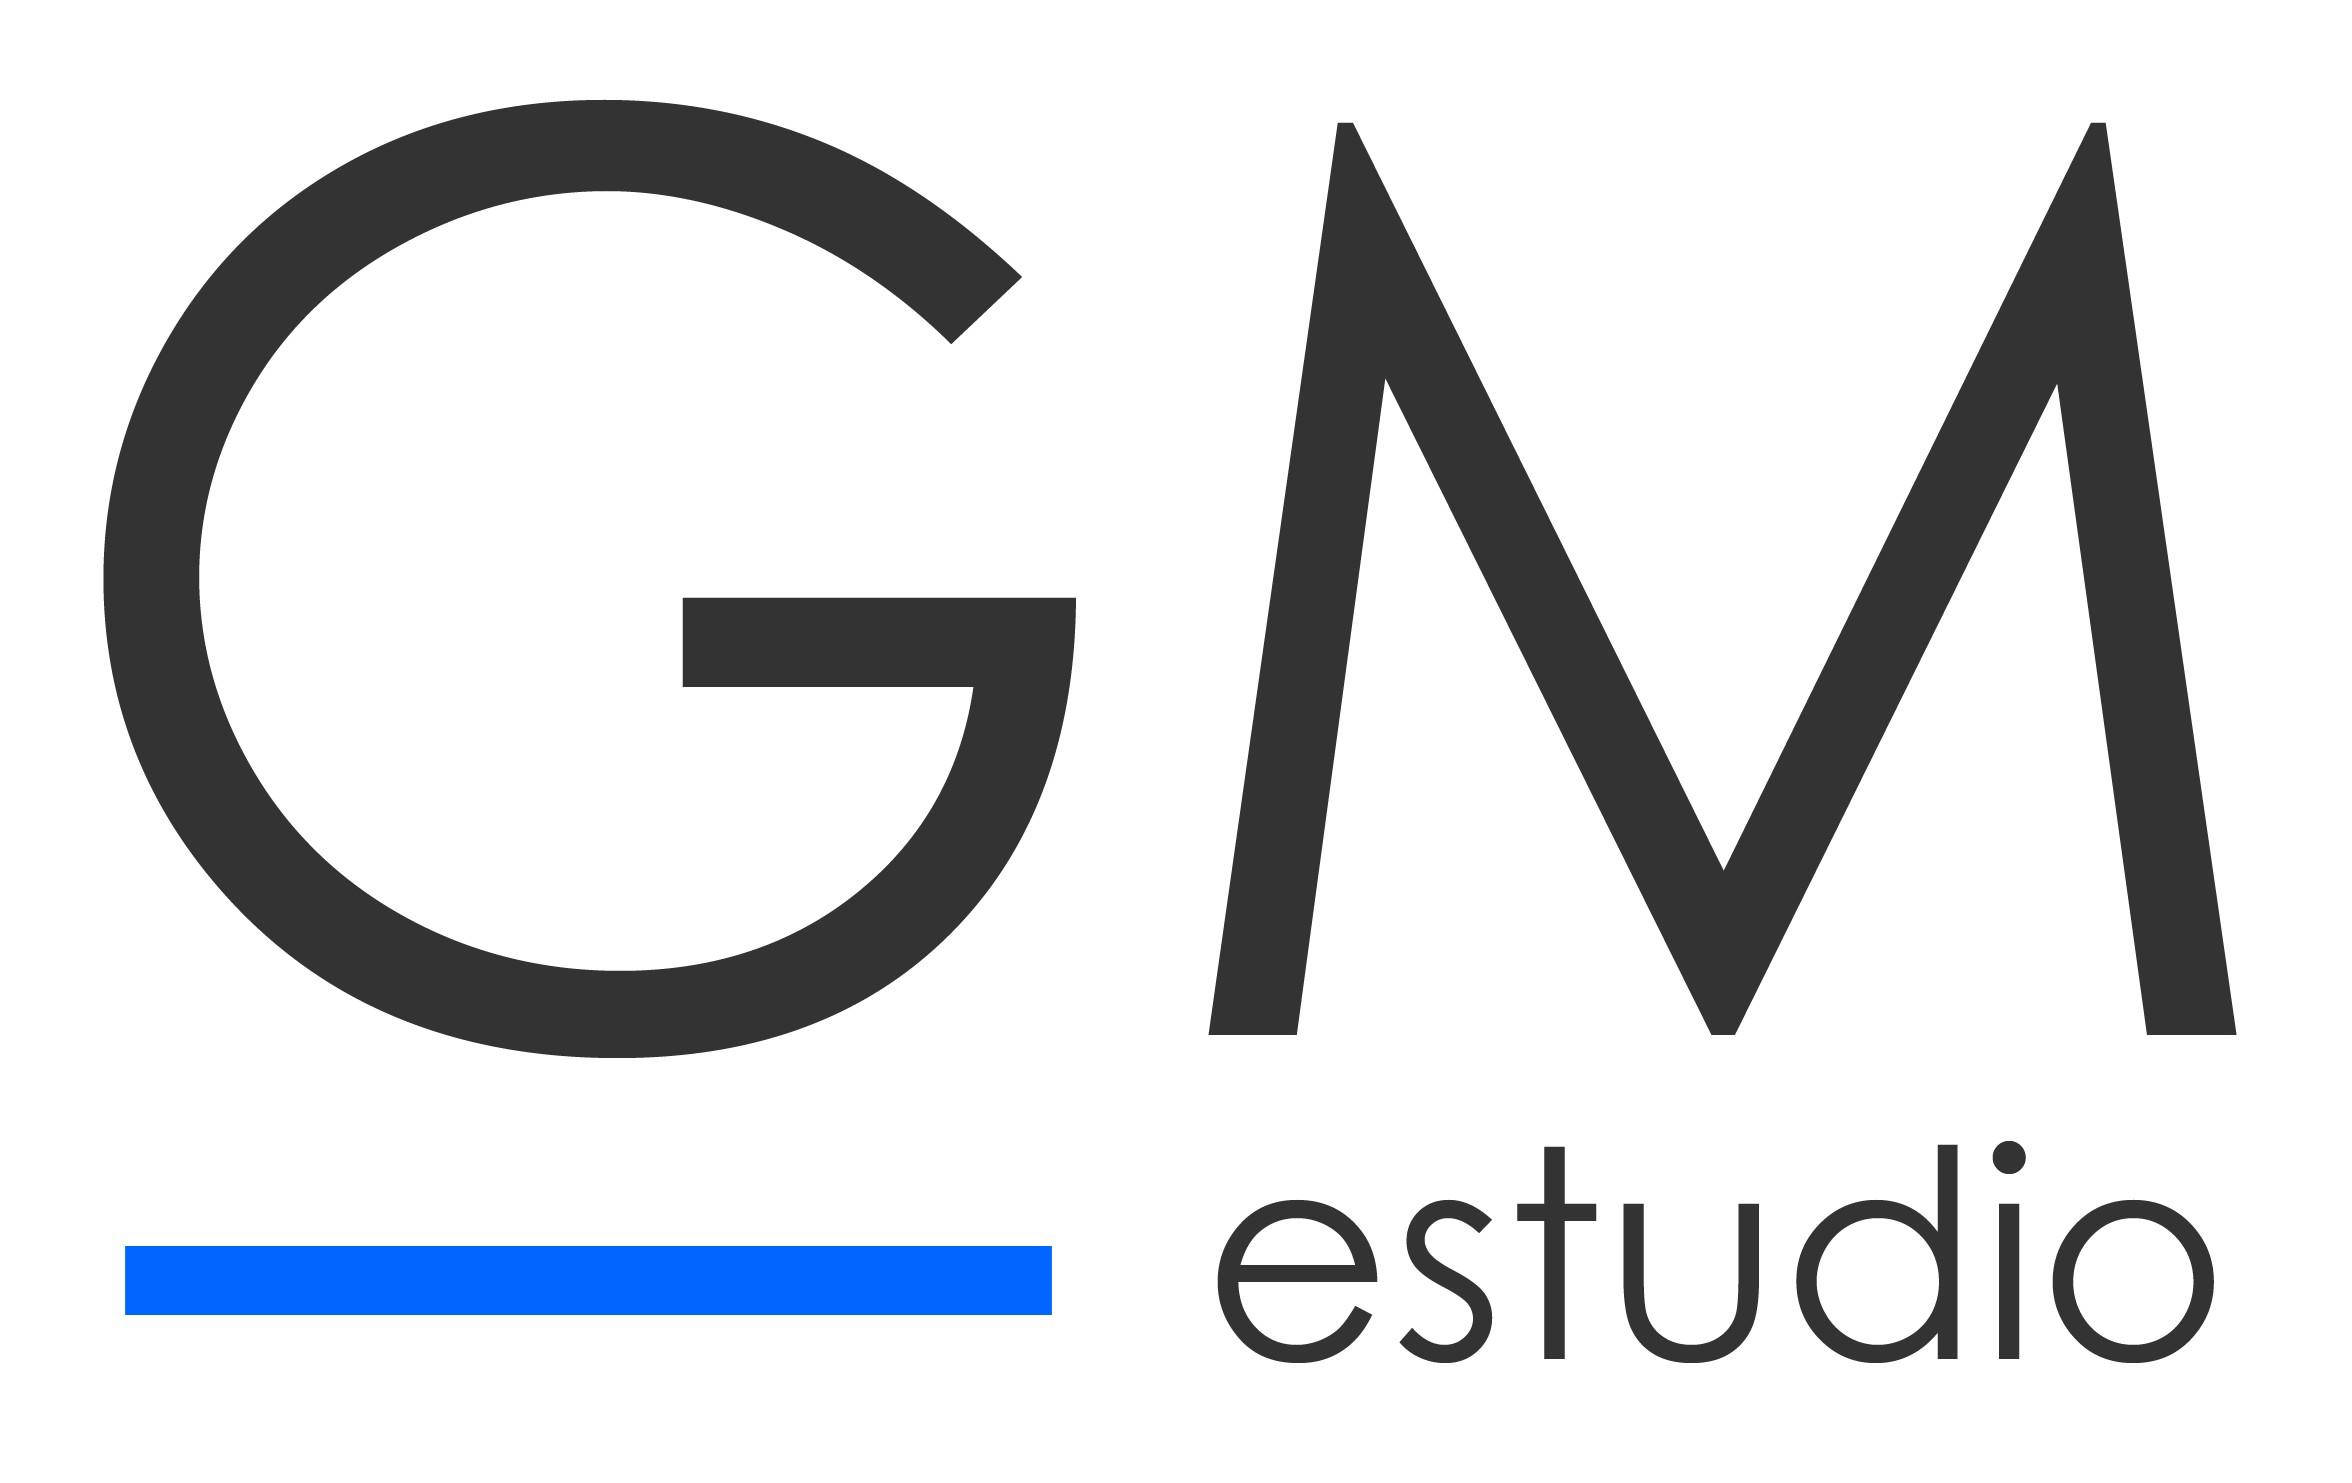 Gm Estudio. Técnicos De La Arquitectura.